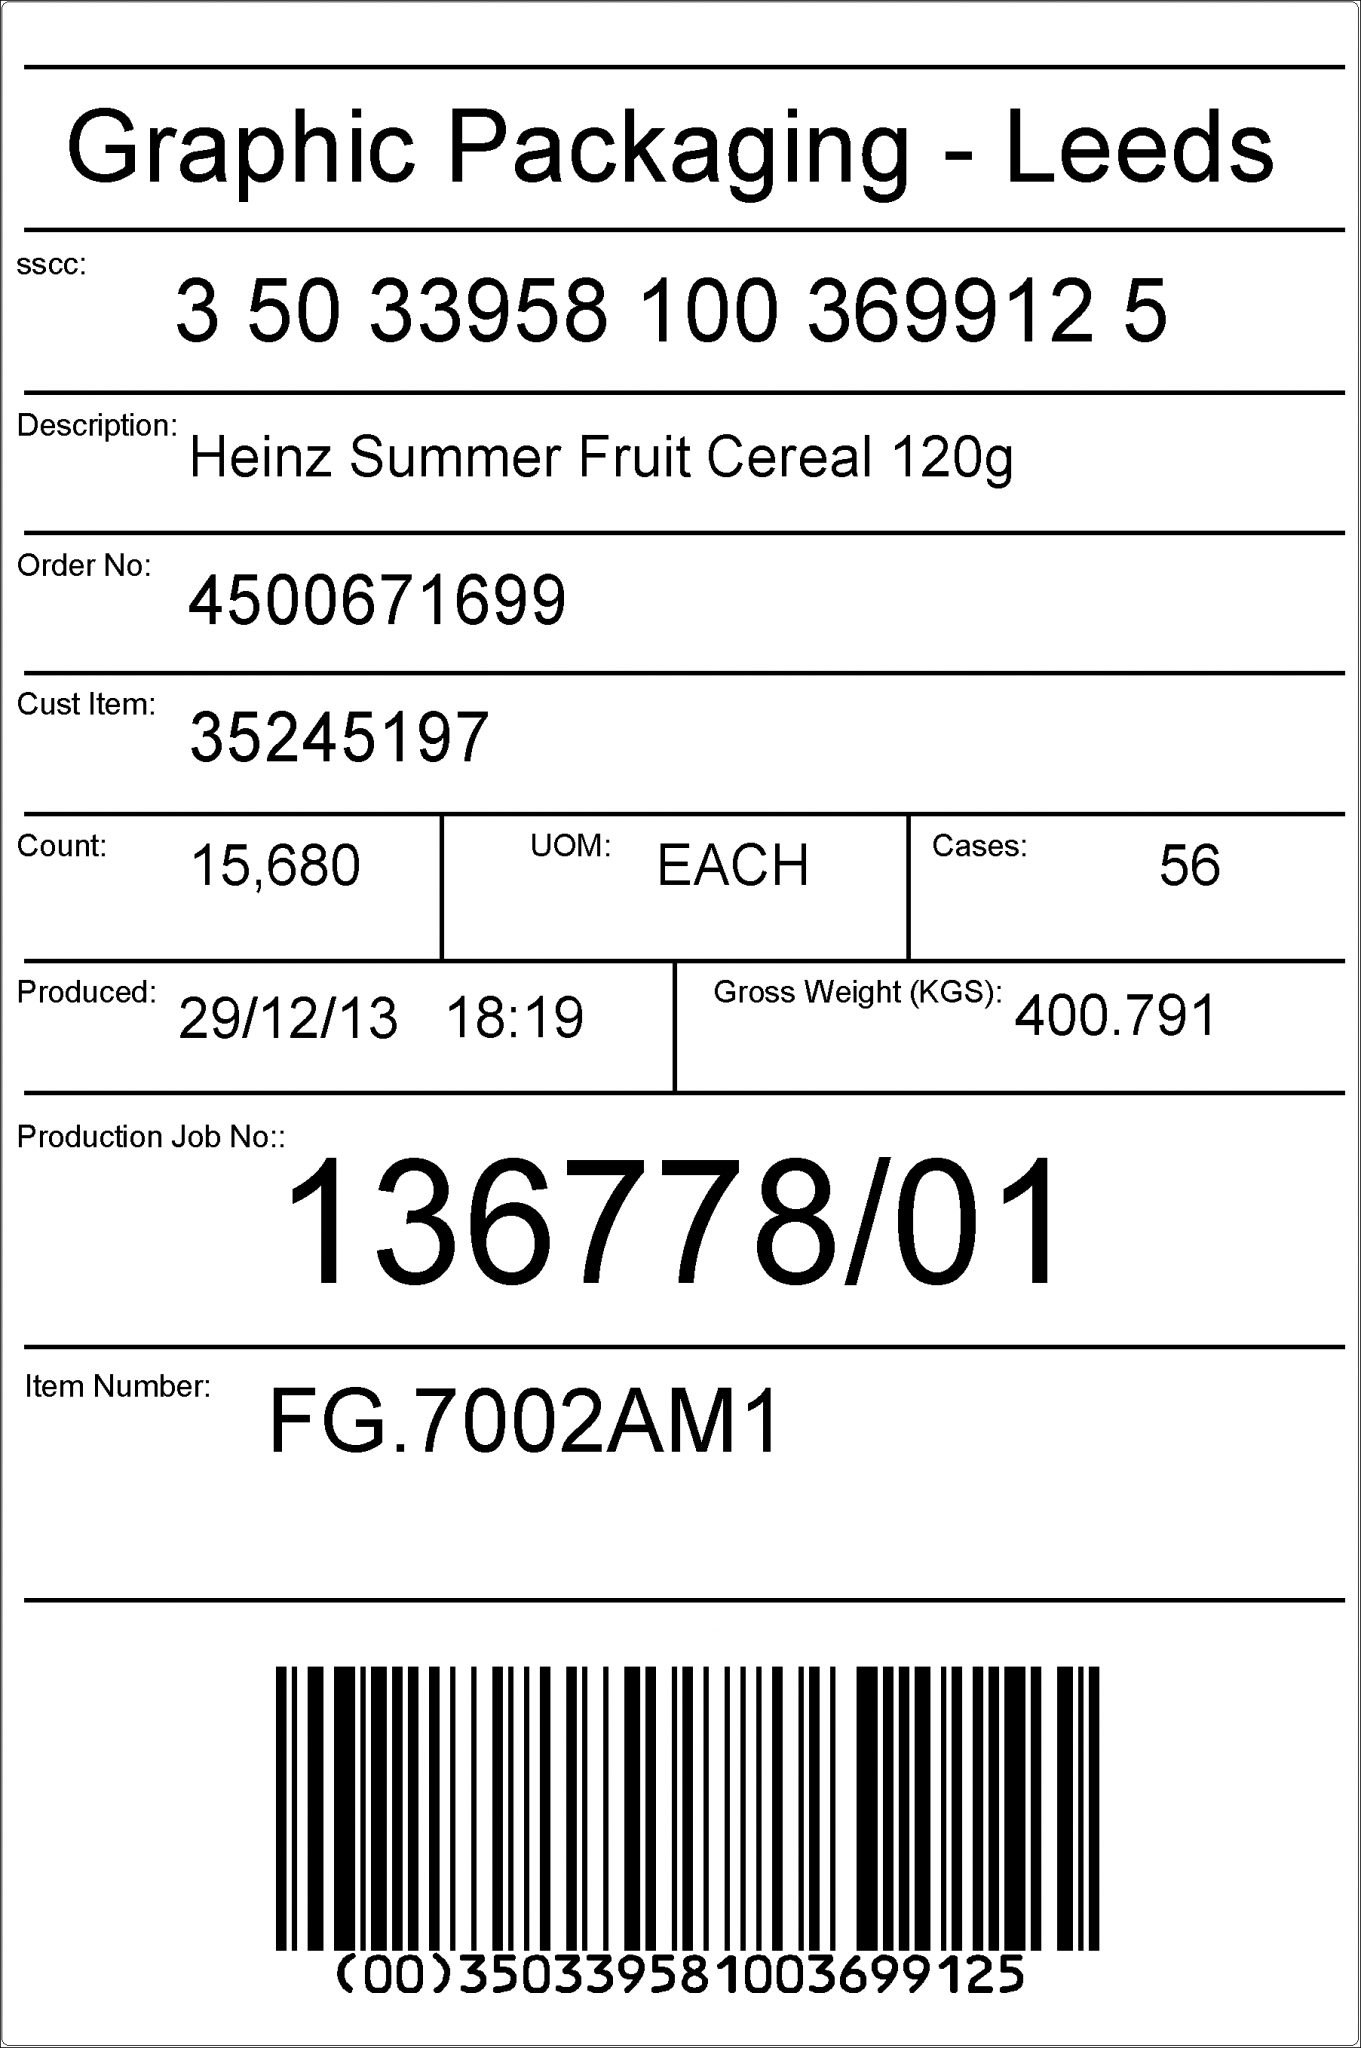 Pallet Labeller Gs Compliant  Advanced Labelling Systems Ltd For Pallet Label Template